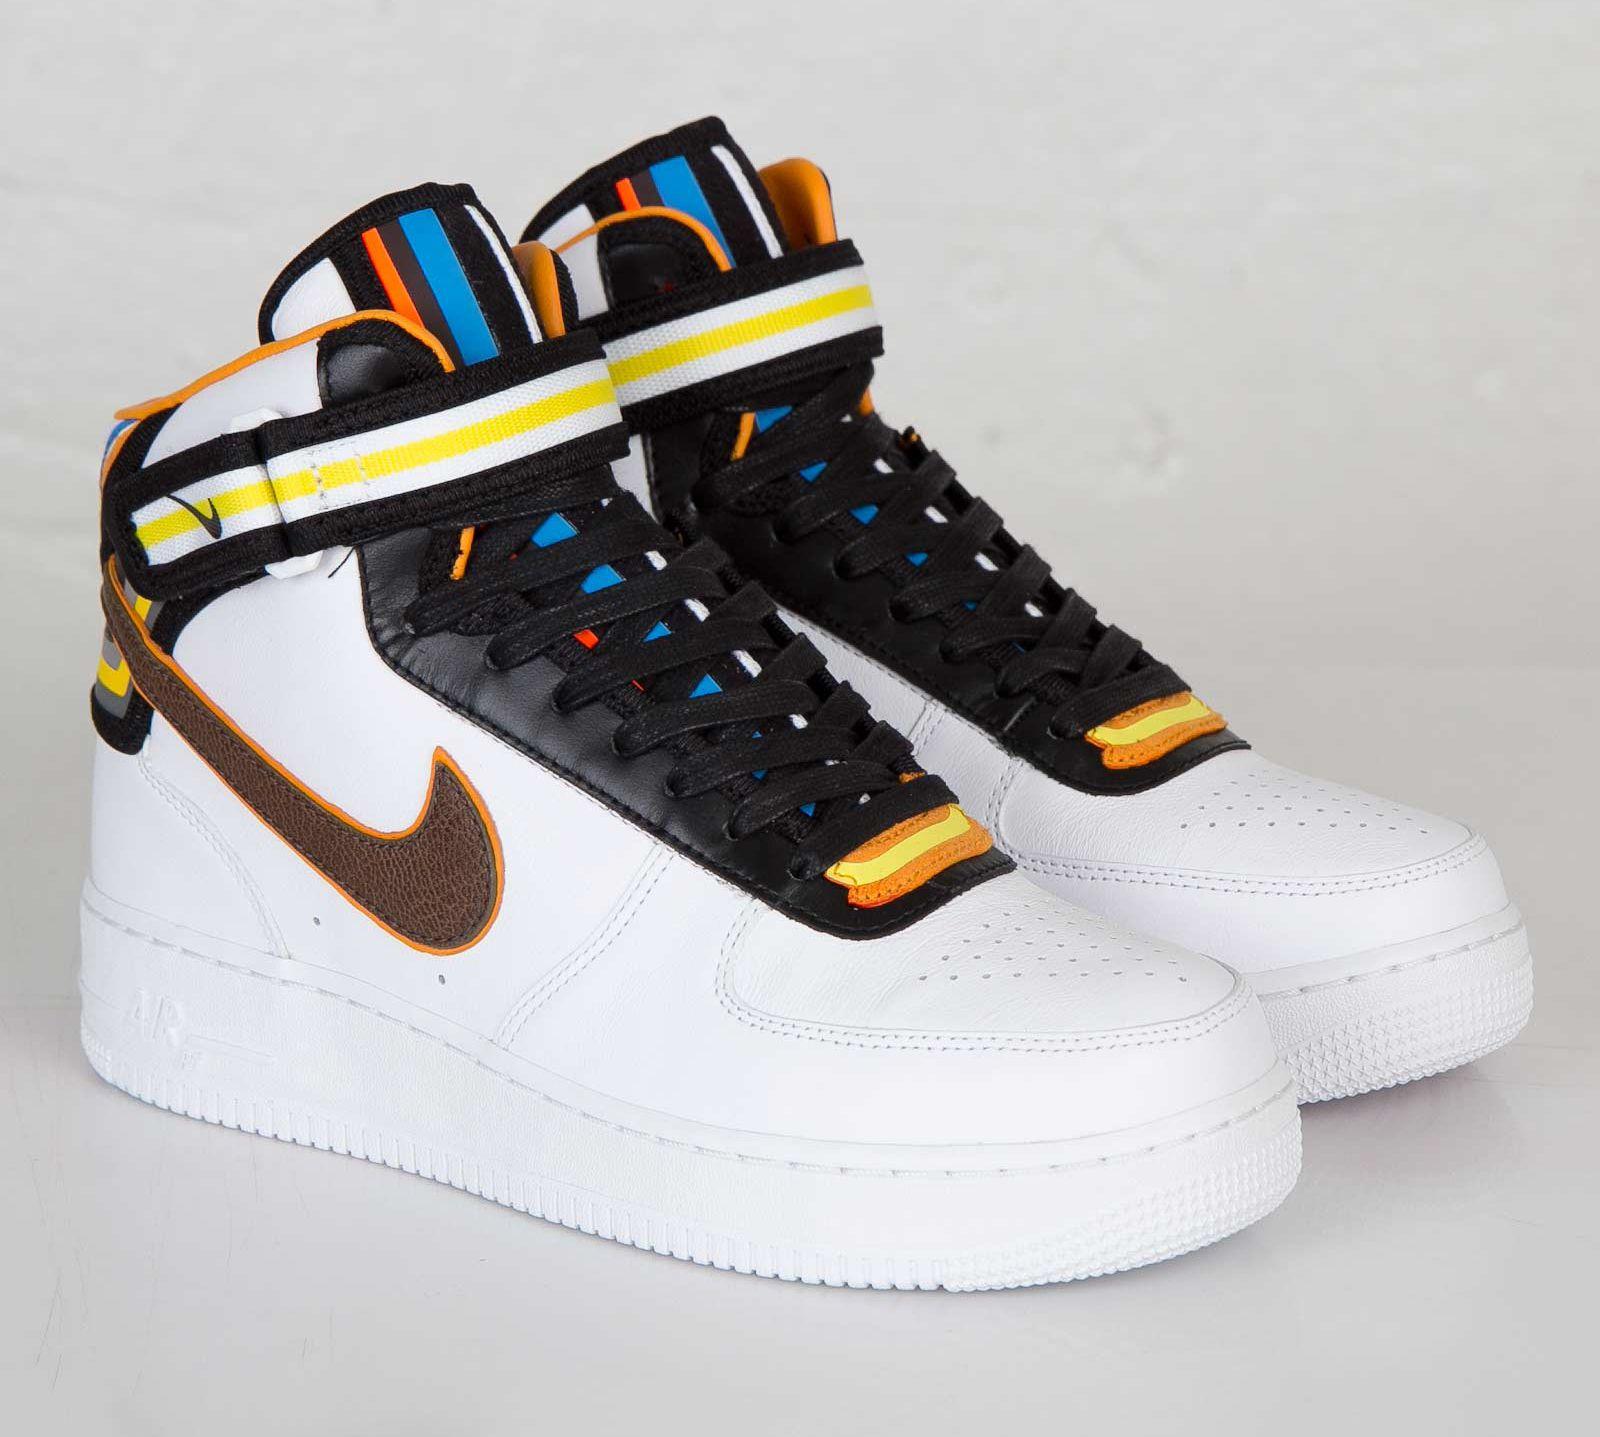 wholesale dealer 22cab a3a7e ... Meet Air Force 1 Riccardo Tisci, basketball shoes tat become a cultural  statement.